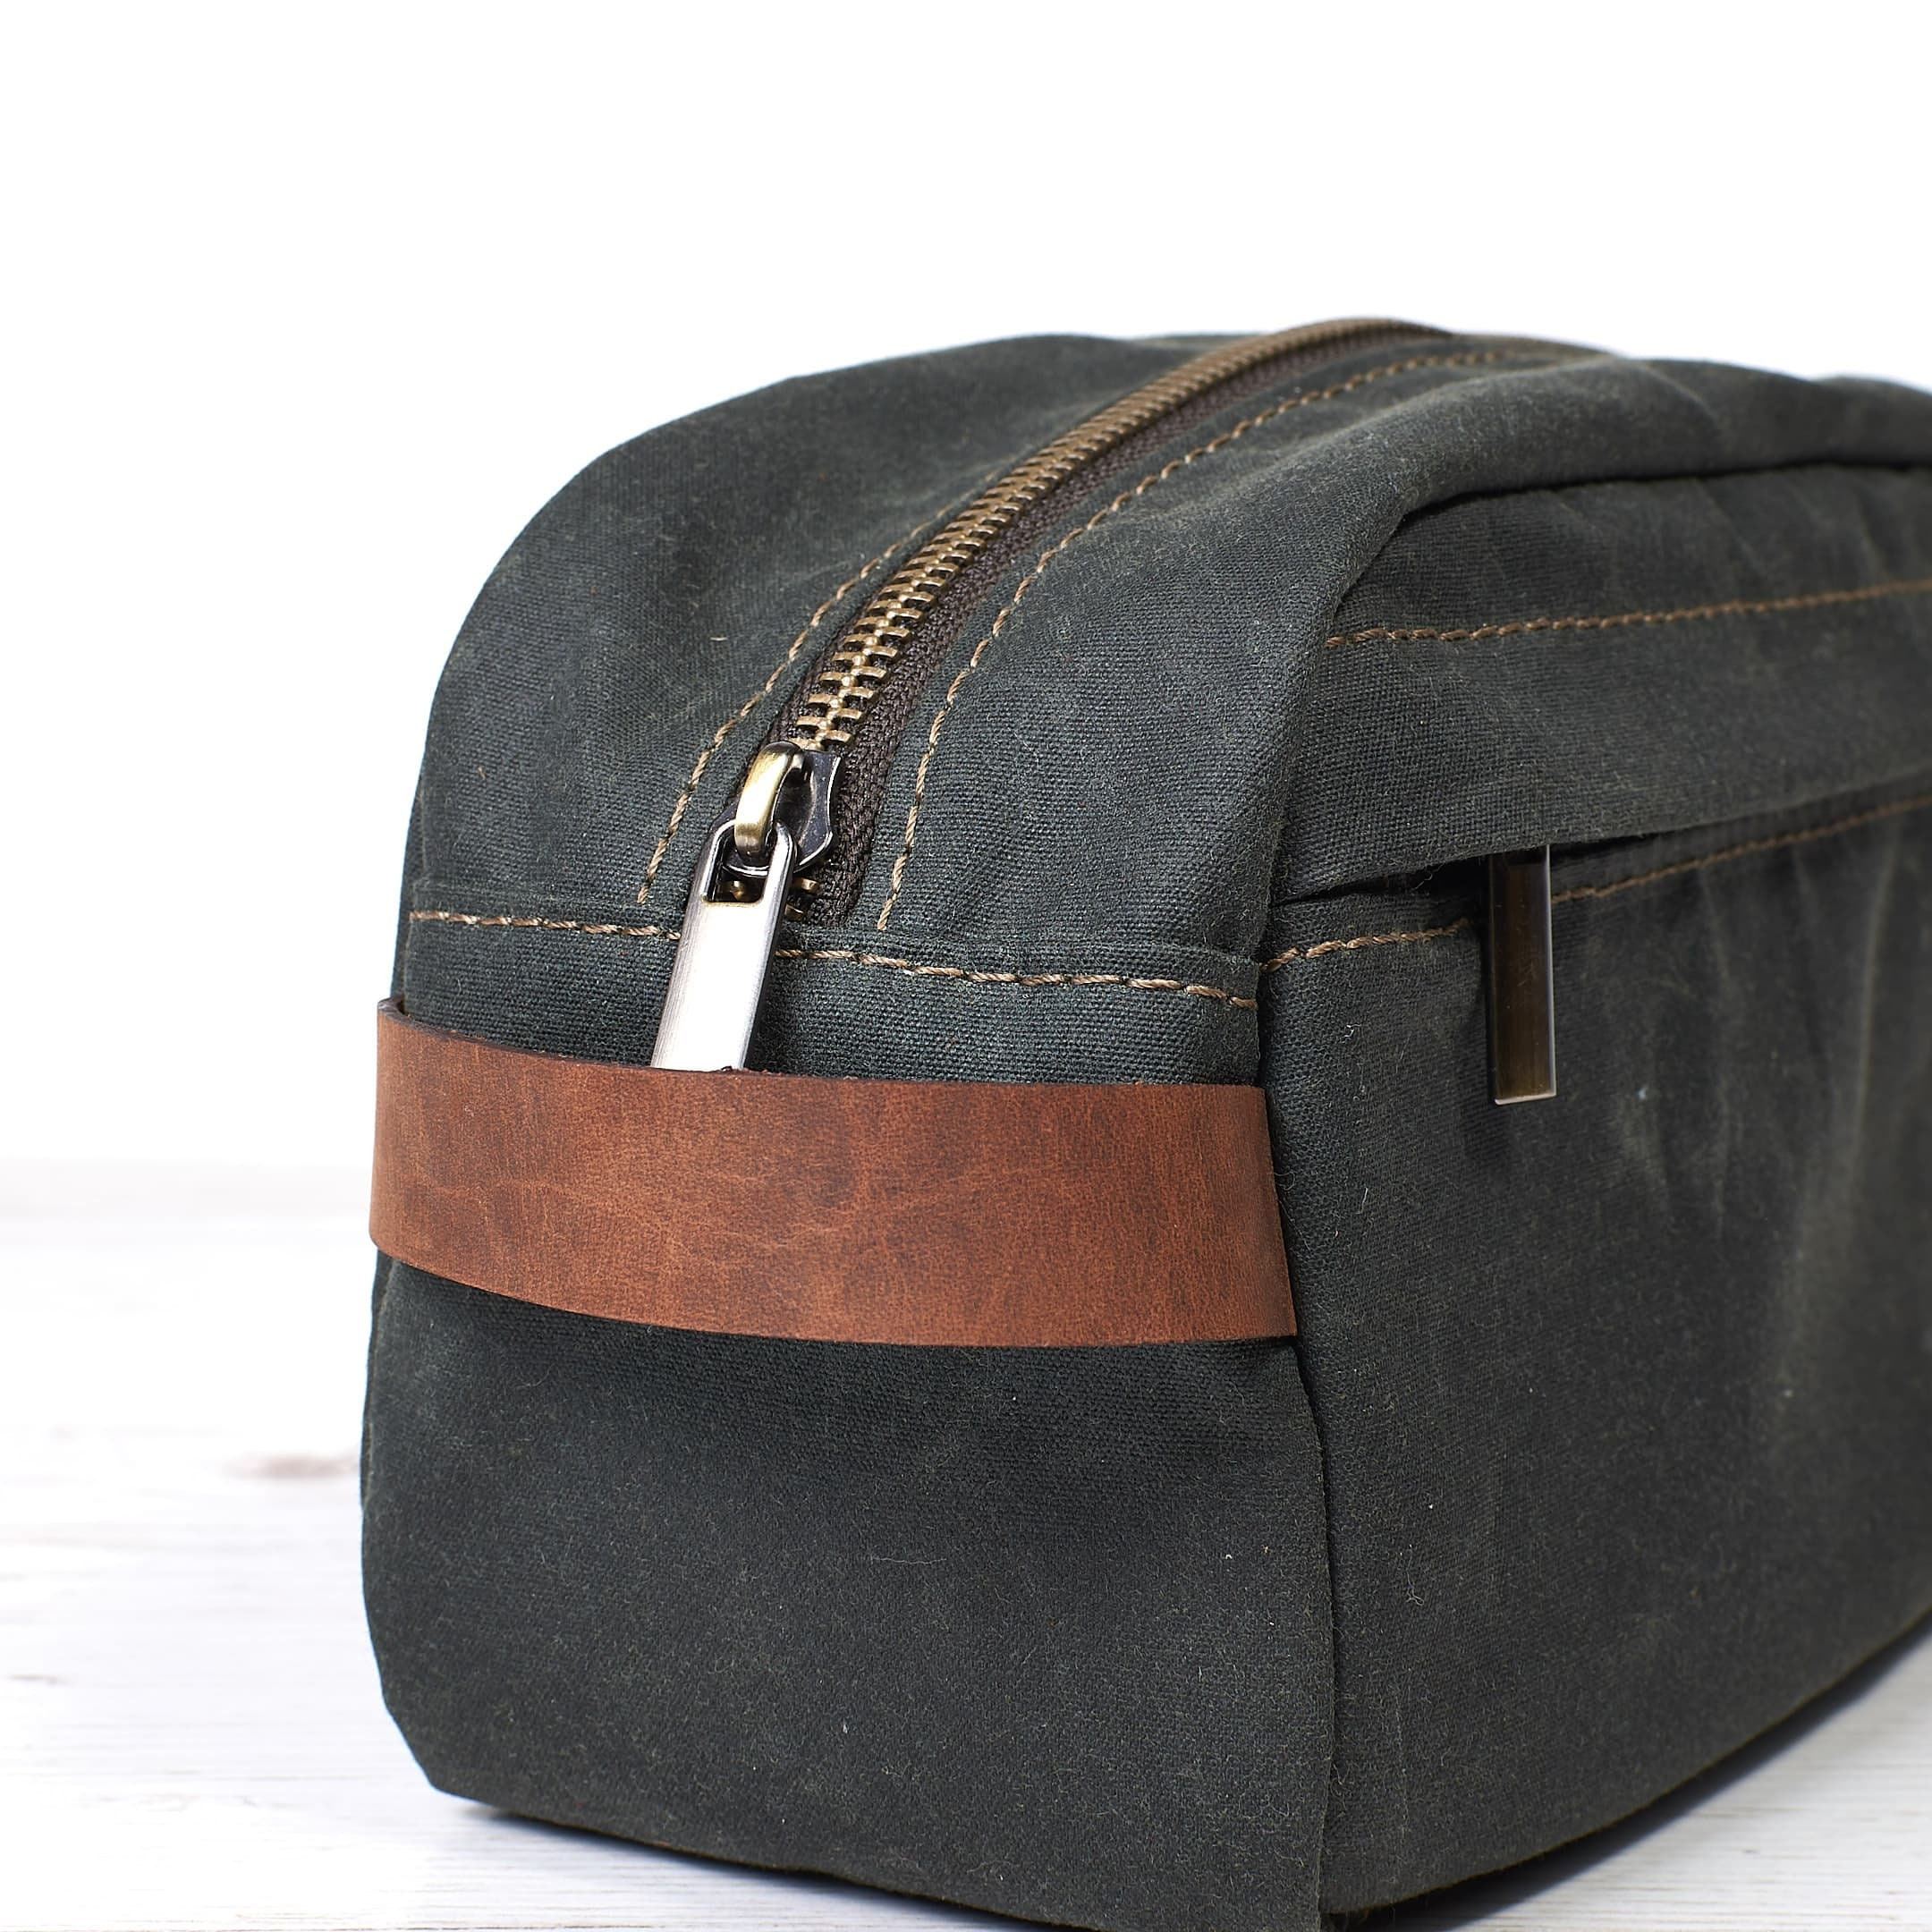 00732d8a73 Waxed canvas dopp kit. Travel accessories. 1